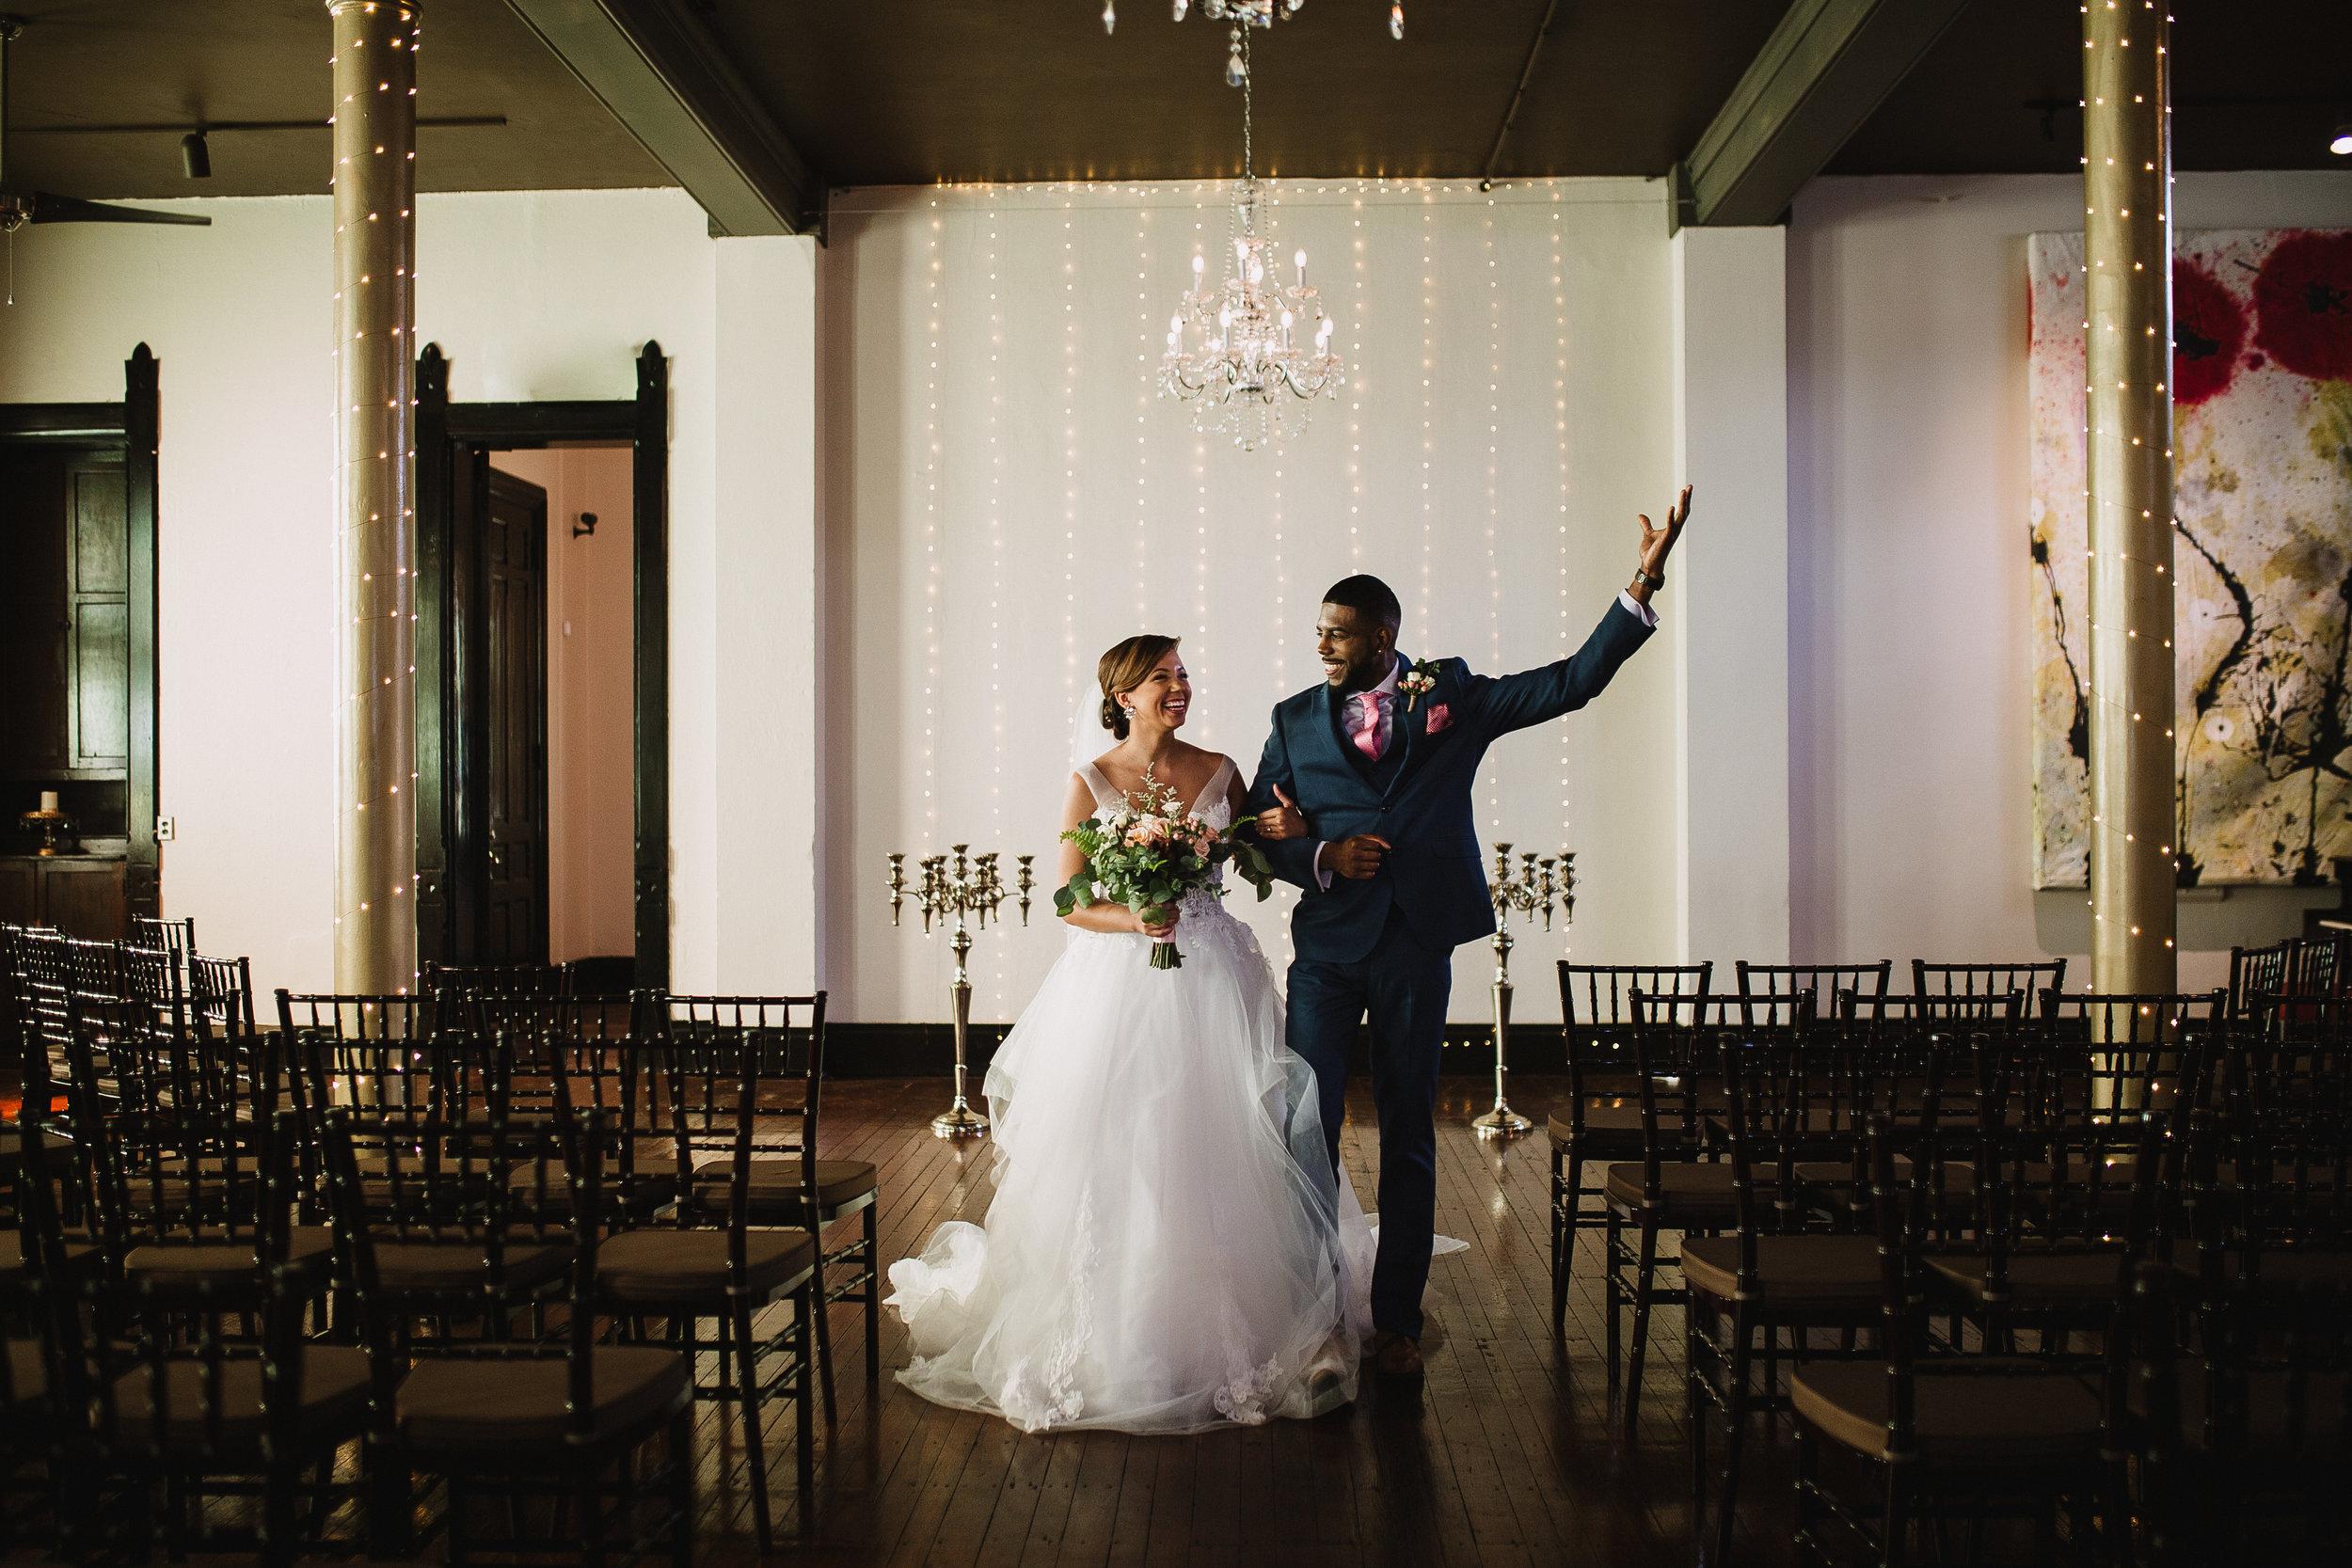 TRADITIONAL-WEDDING-PATTERNMAGAZINE-REAGANLYNNPHOTOGRAPHY-INDIANAPOLIS-INDIANA-5.jpg